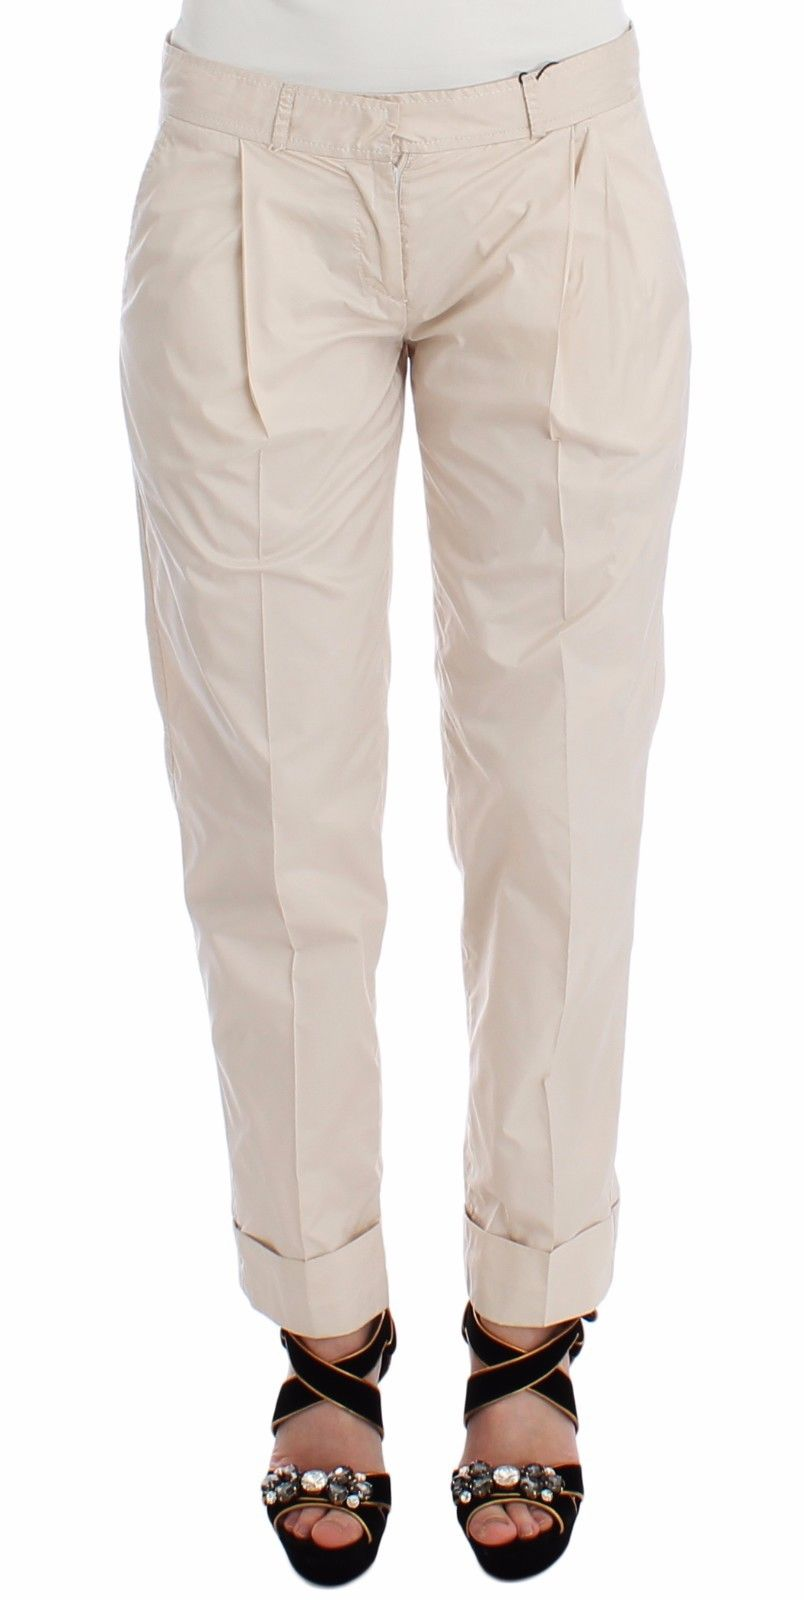 Ermanno Scervino Women's Chinos Trouser Beige MOM26754 - IT40 S